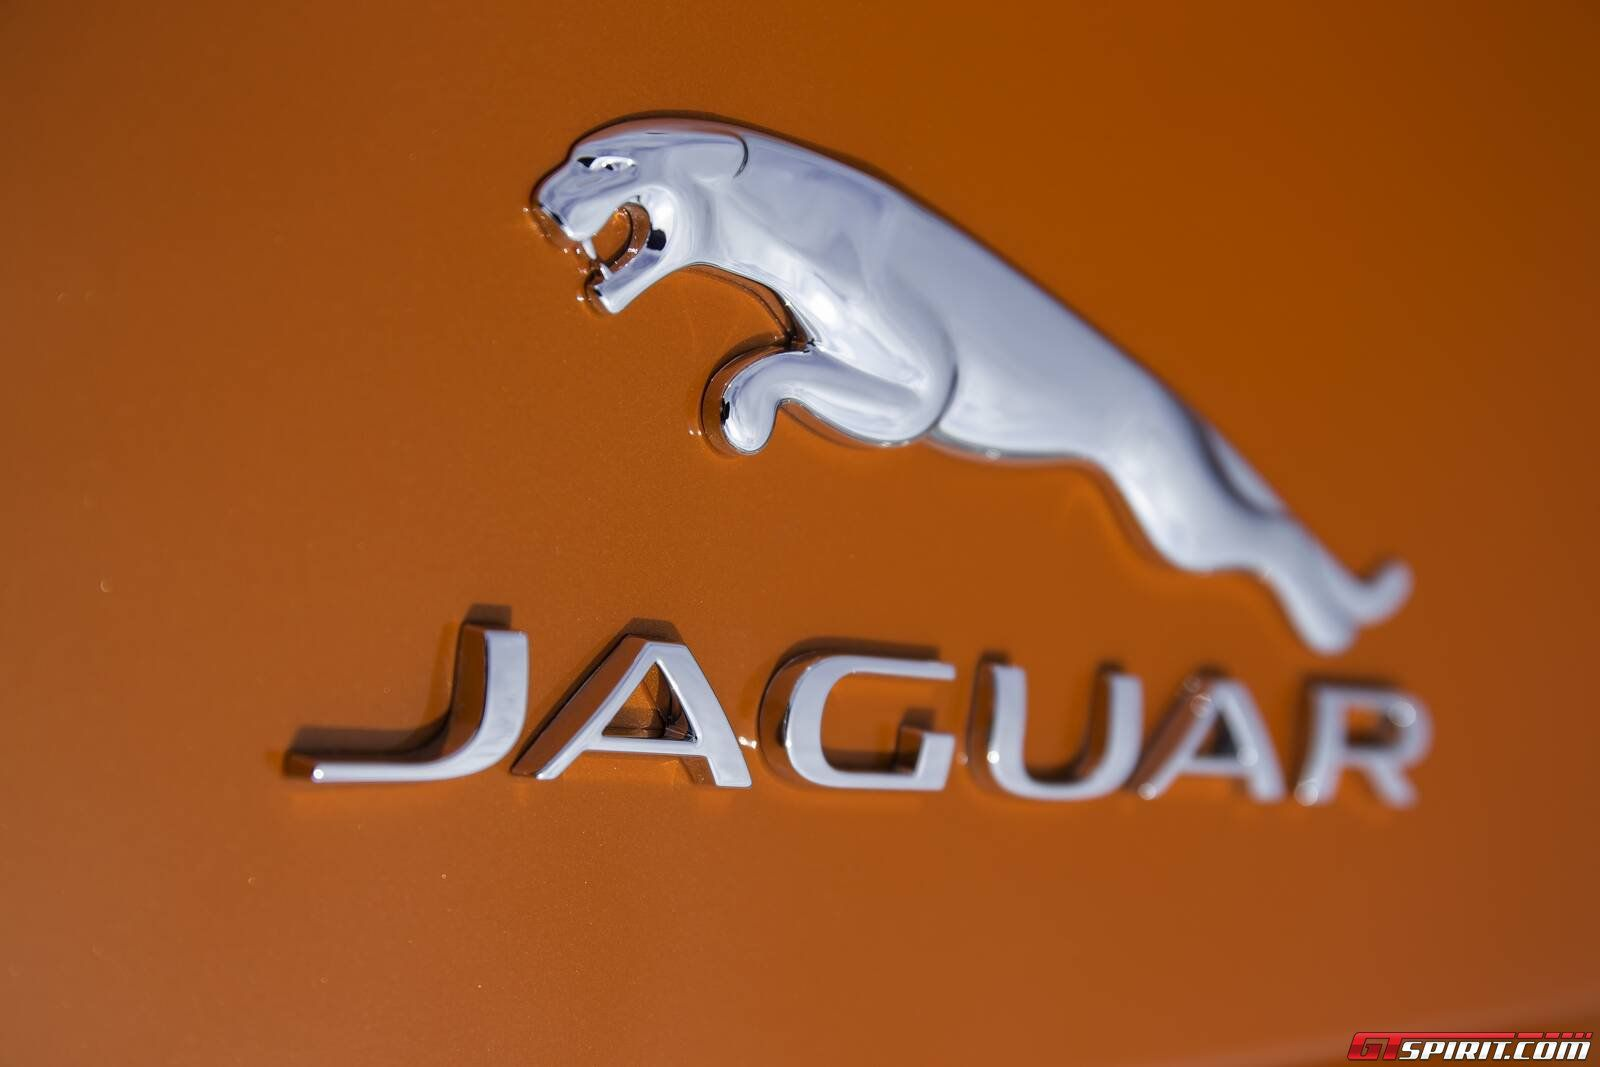 First Drive Jaguar F Type V8 S Jaguar F Type Car Badges Jaguar